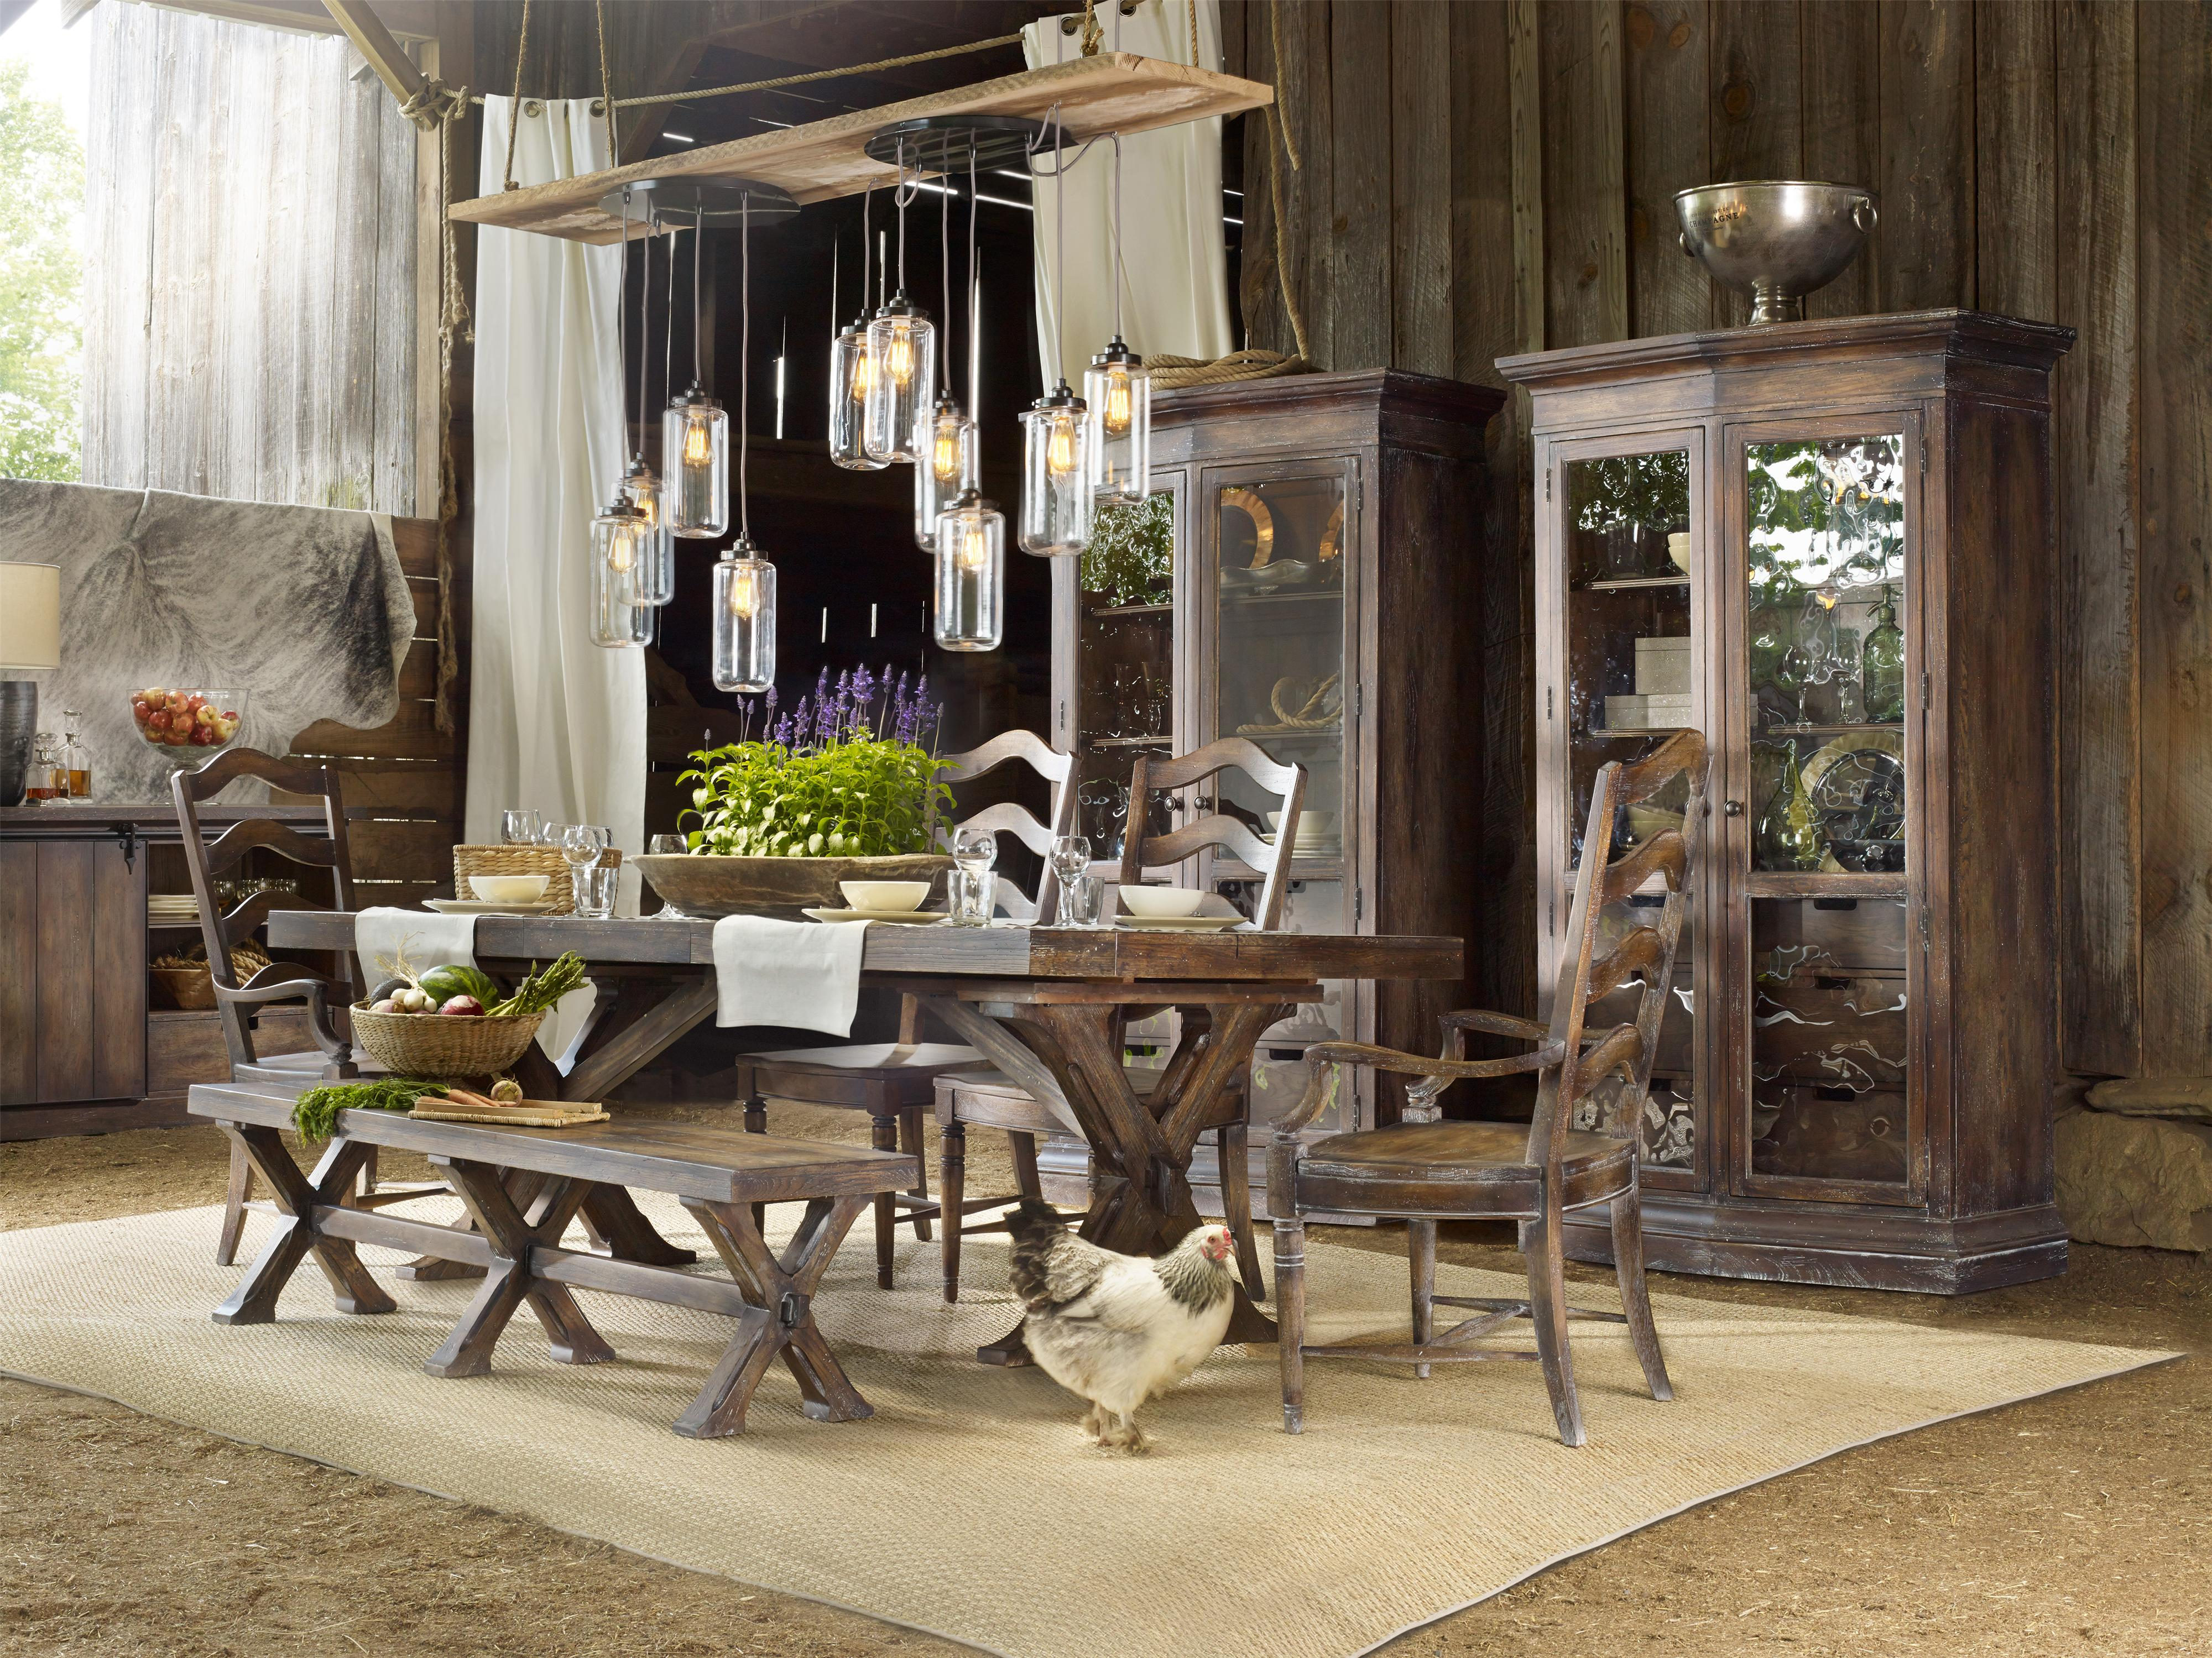 Hooker Furniture Willow Bend Formal Dining Room Group - Item Number: 5343 Dining Room Group 1